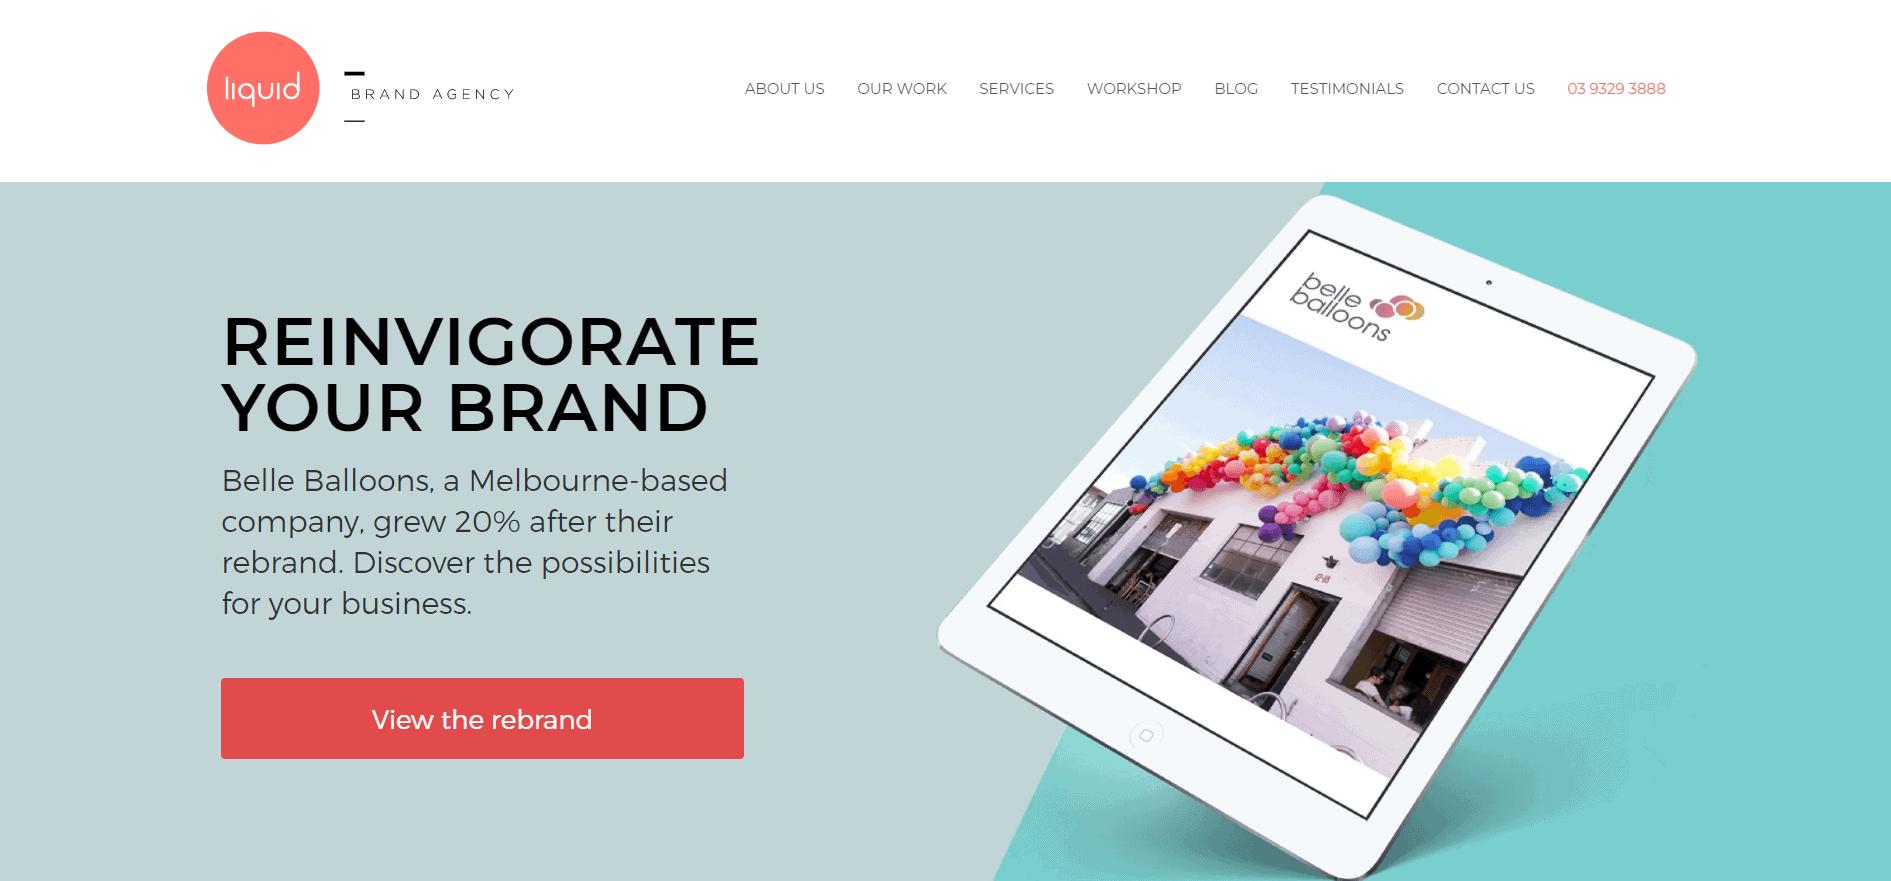 liquid brand agency